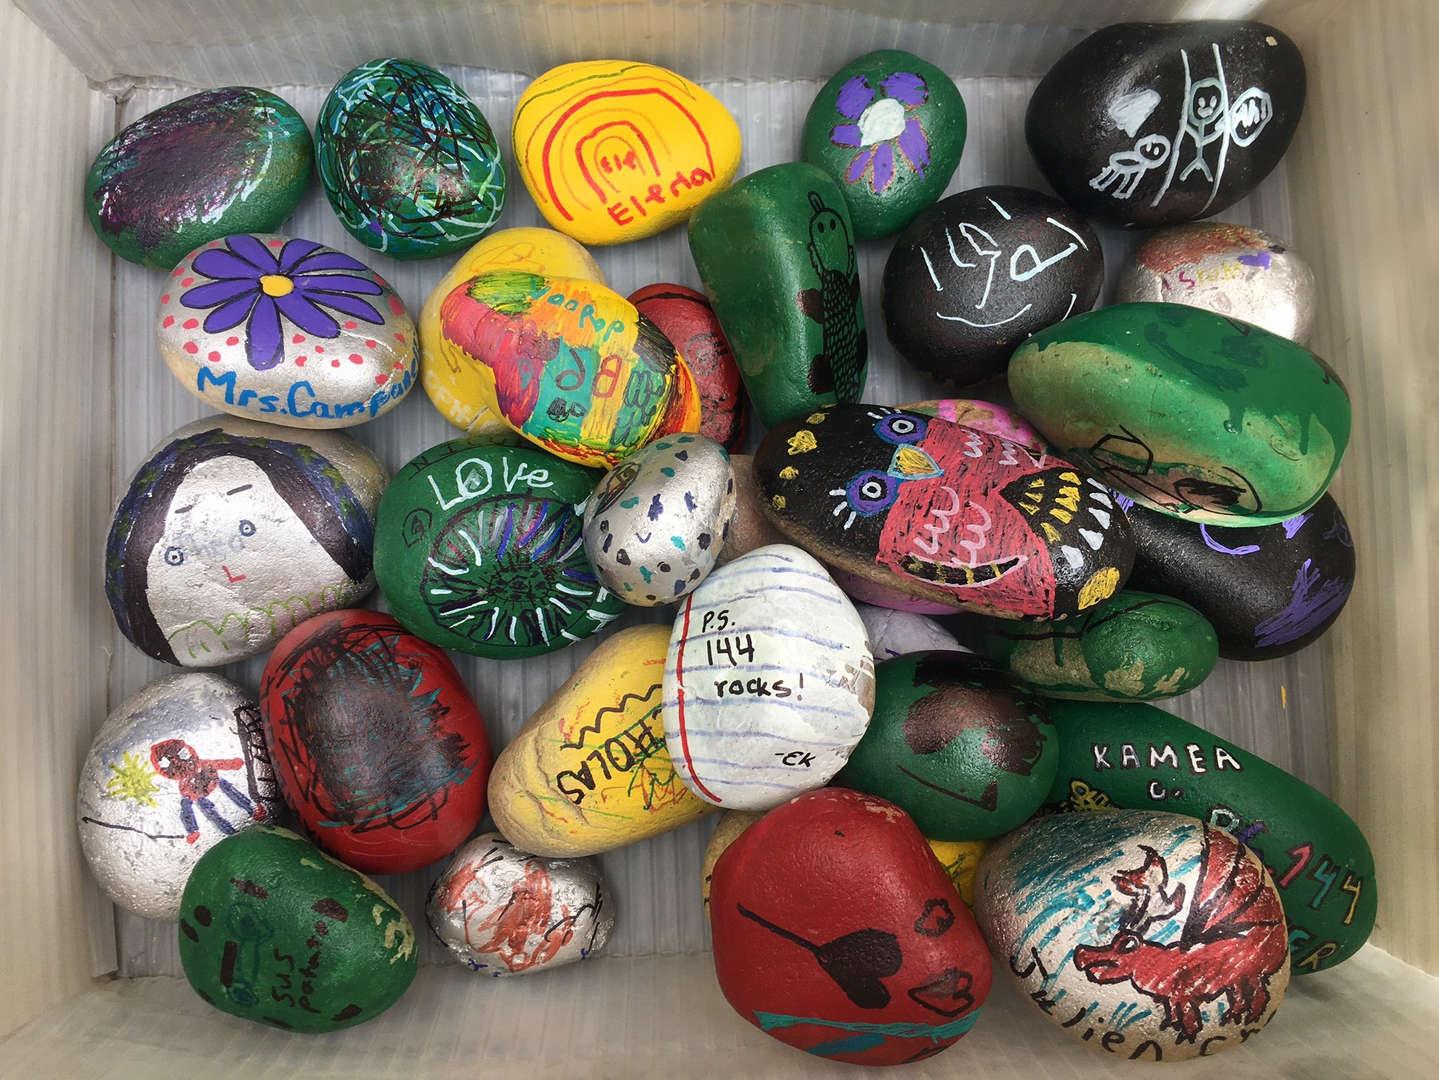 Group of rocks!